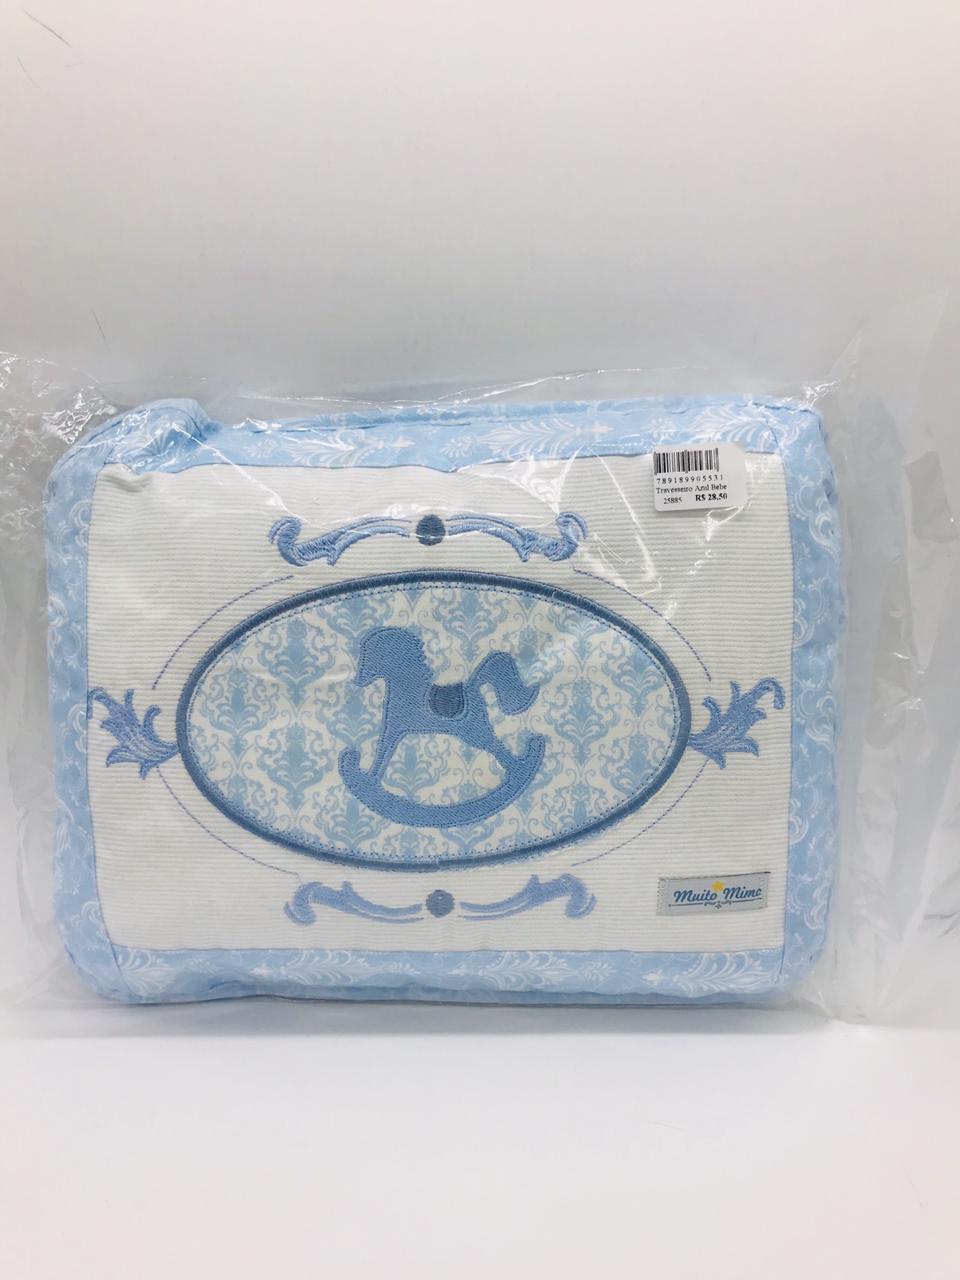 Travesseiro Cavalinho Azul g 28x35 - m Mimo Minasrey Ref 5531